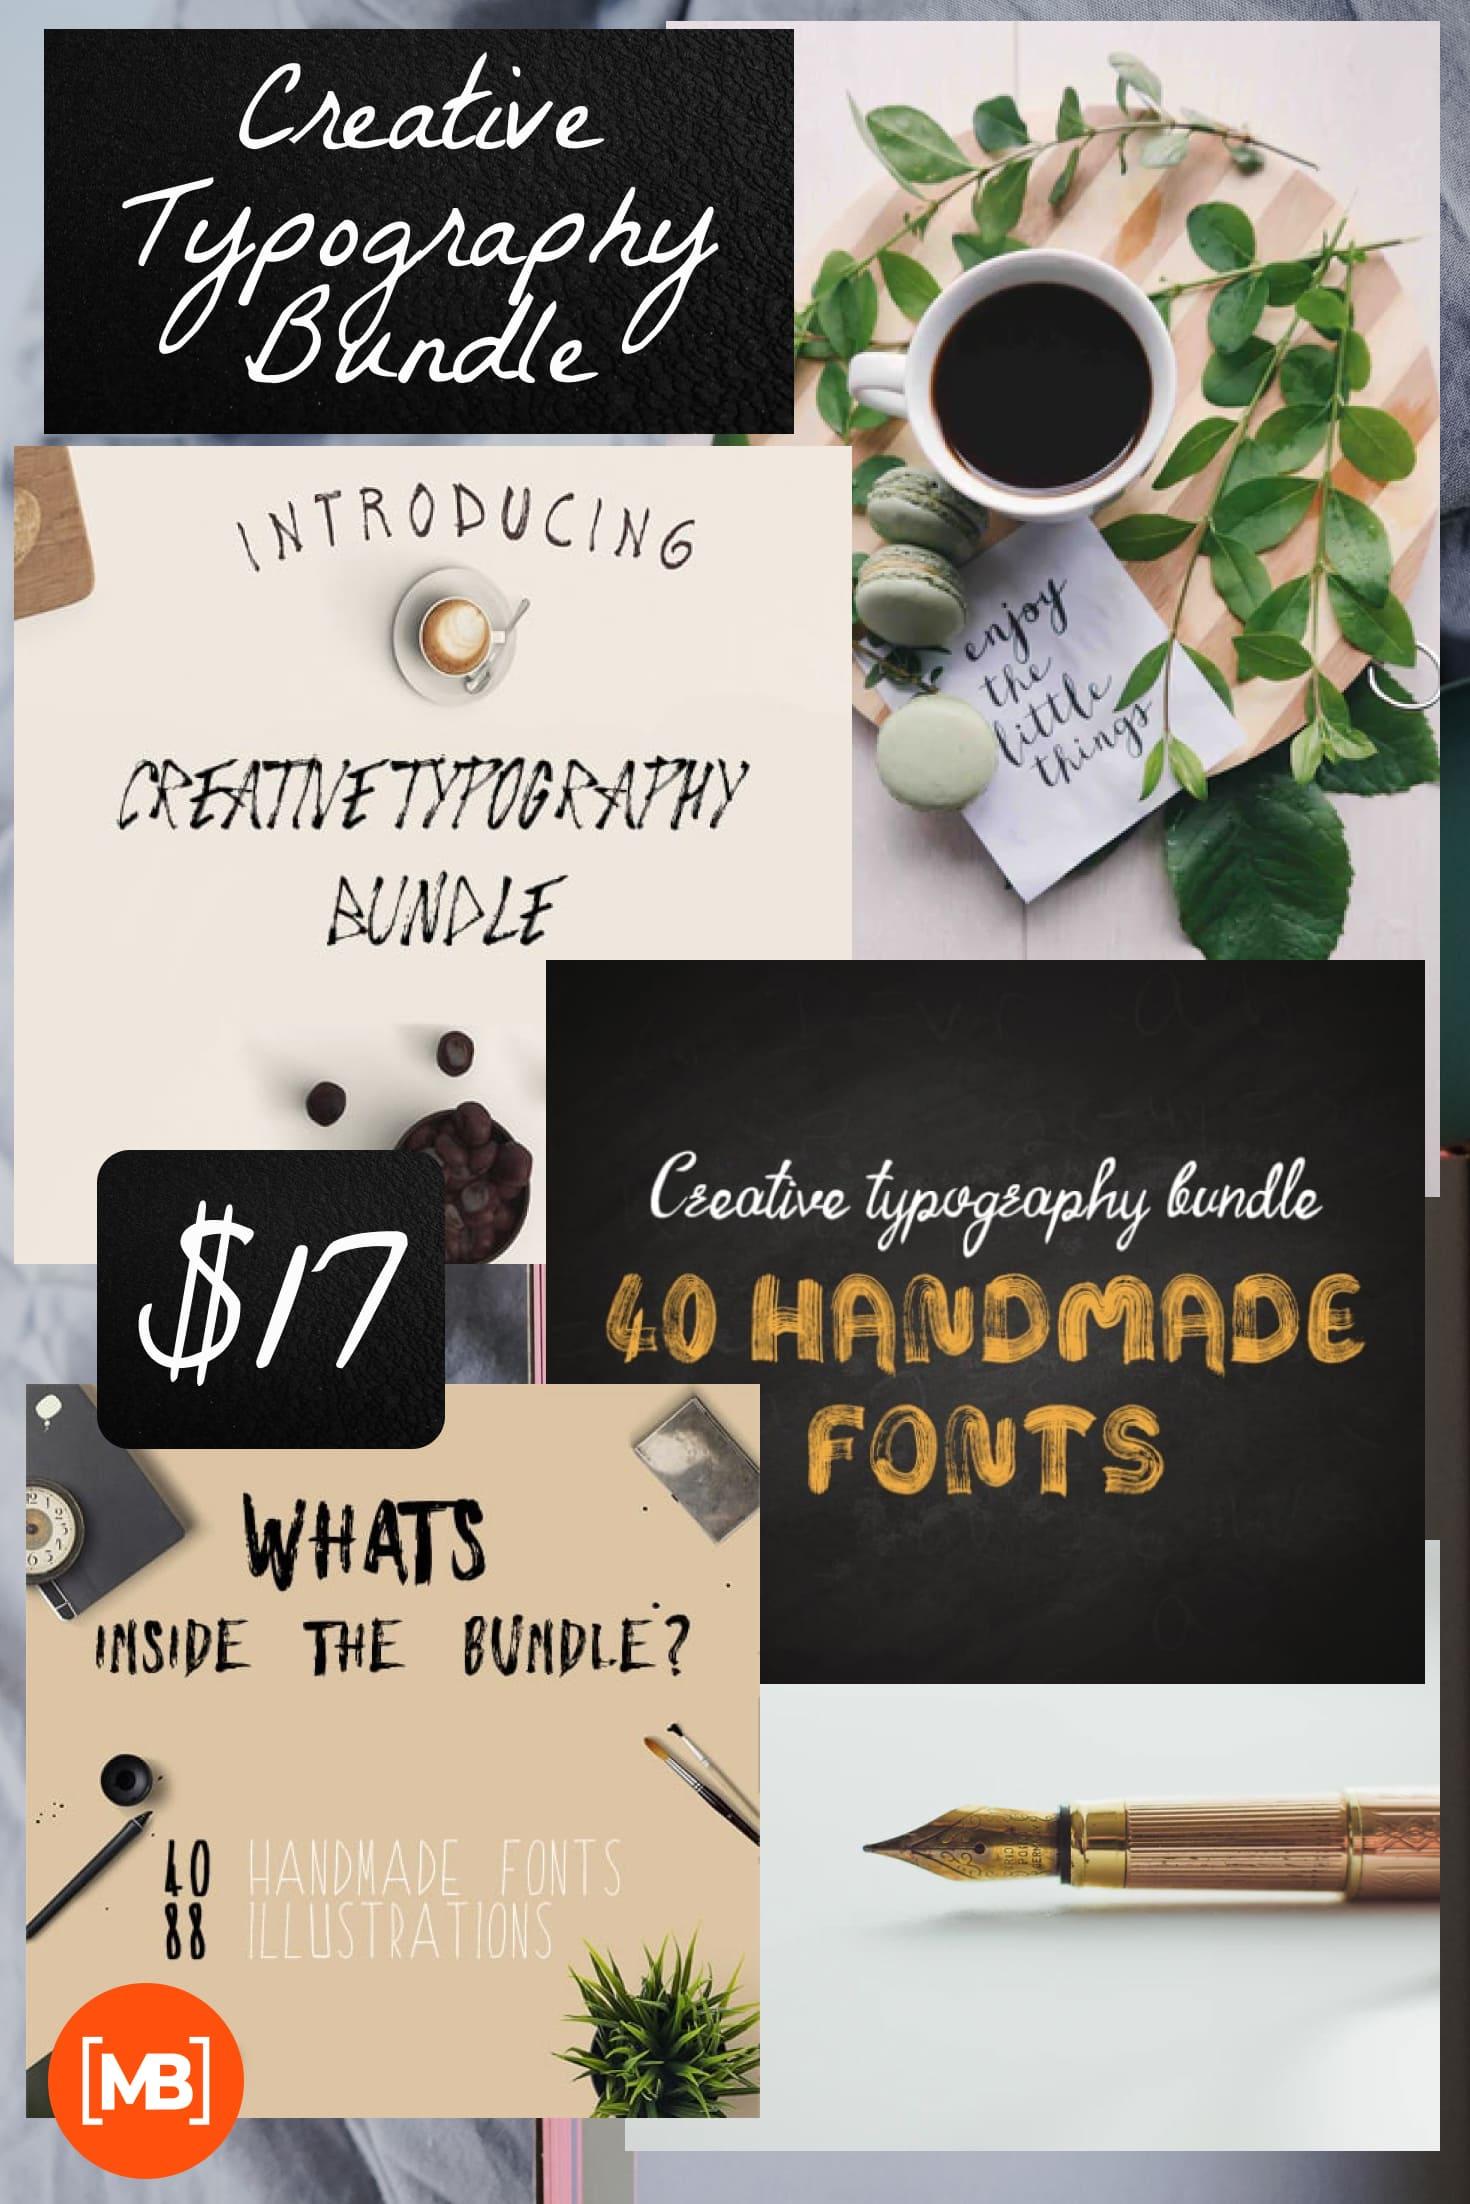 Pinterest Image: Creative Typography Bundle - $17.